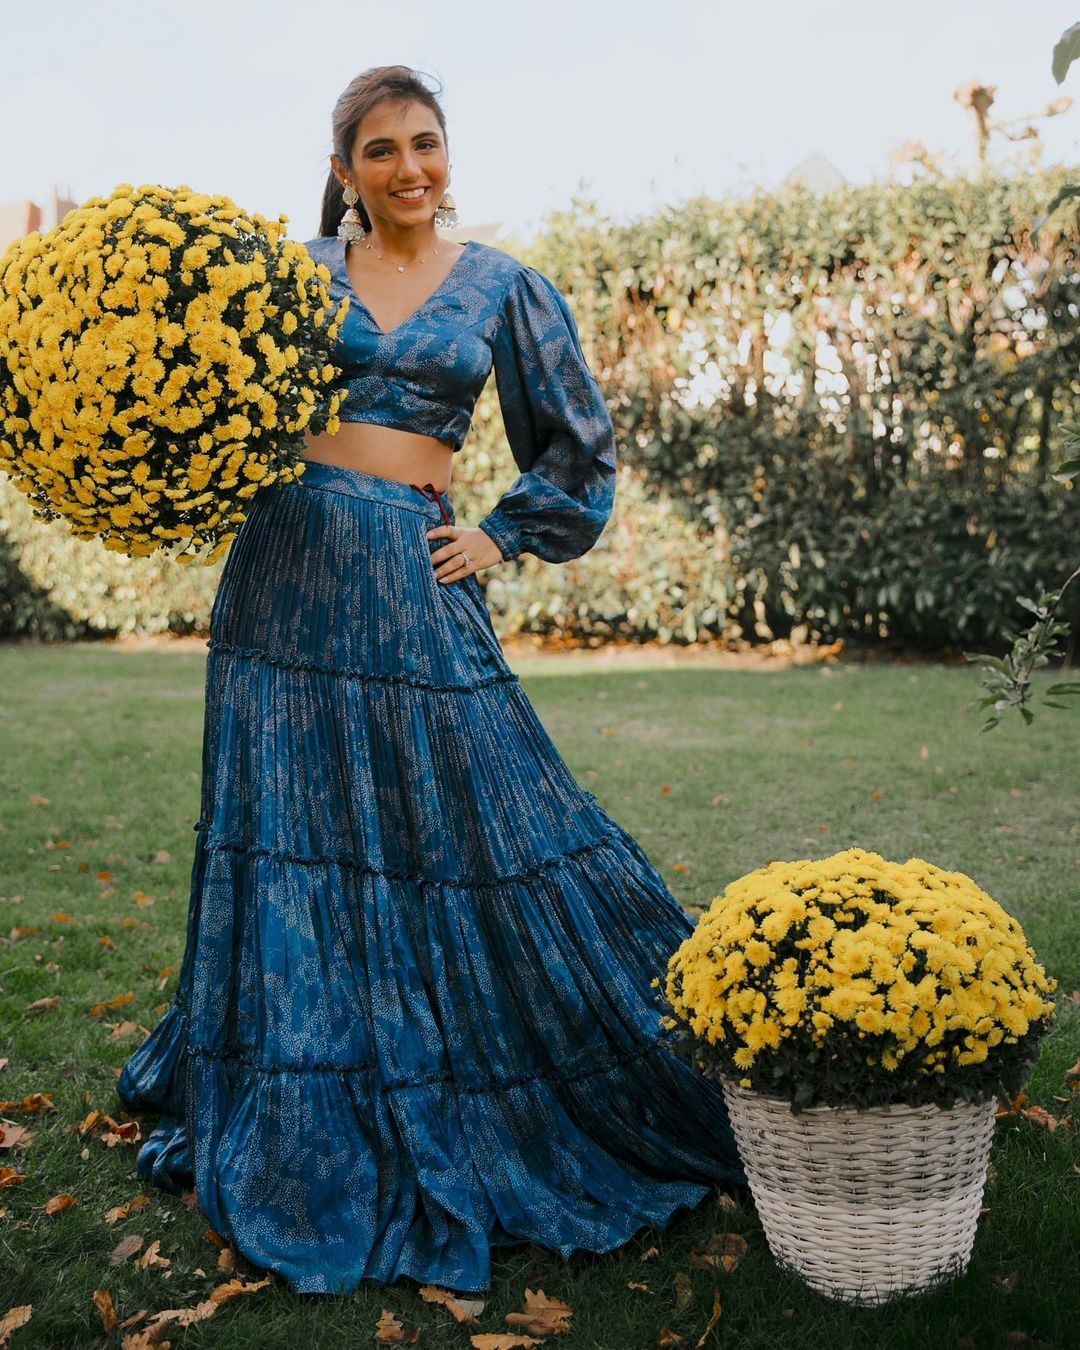 Masoom Minawala Mehta looking breathtakingly beautiful in Designer ash gold lehenga || Planet Bollywood || Media Tribe || The-Uncovered